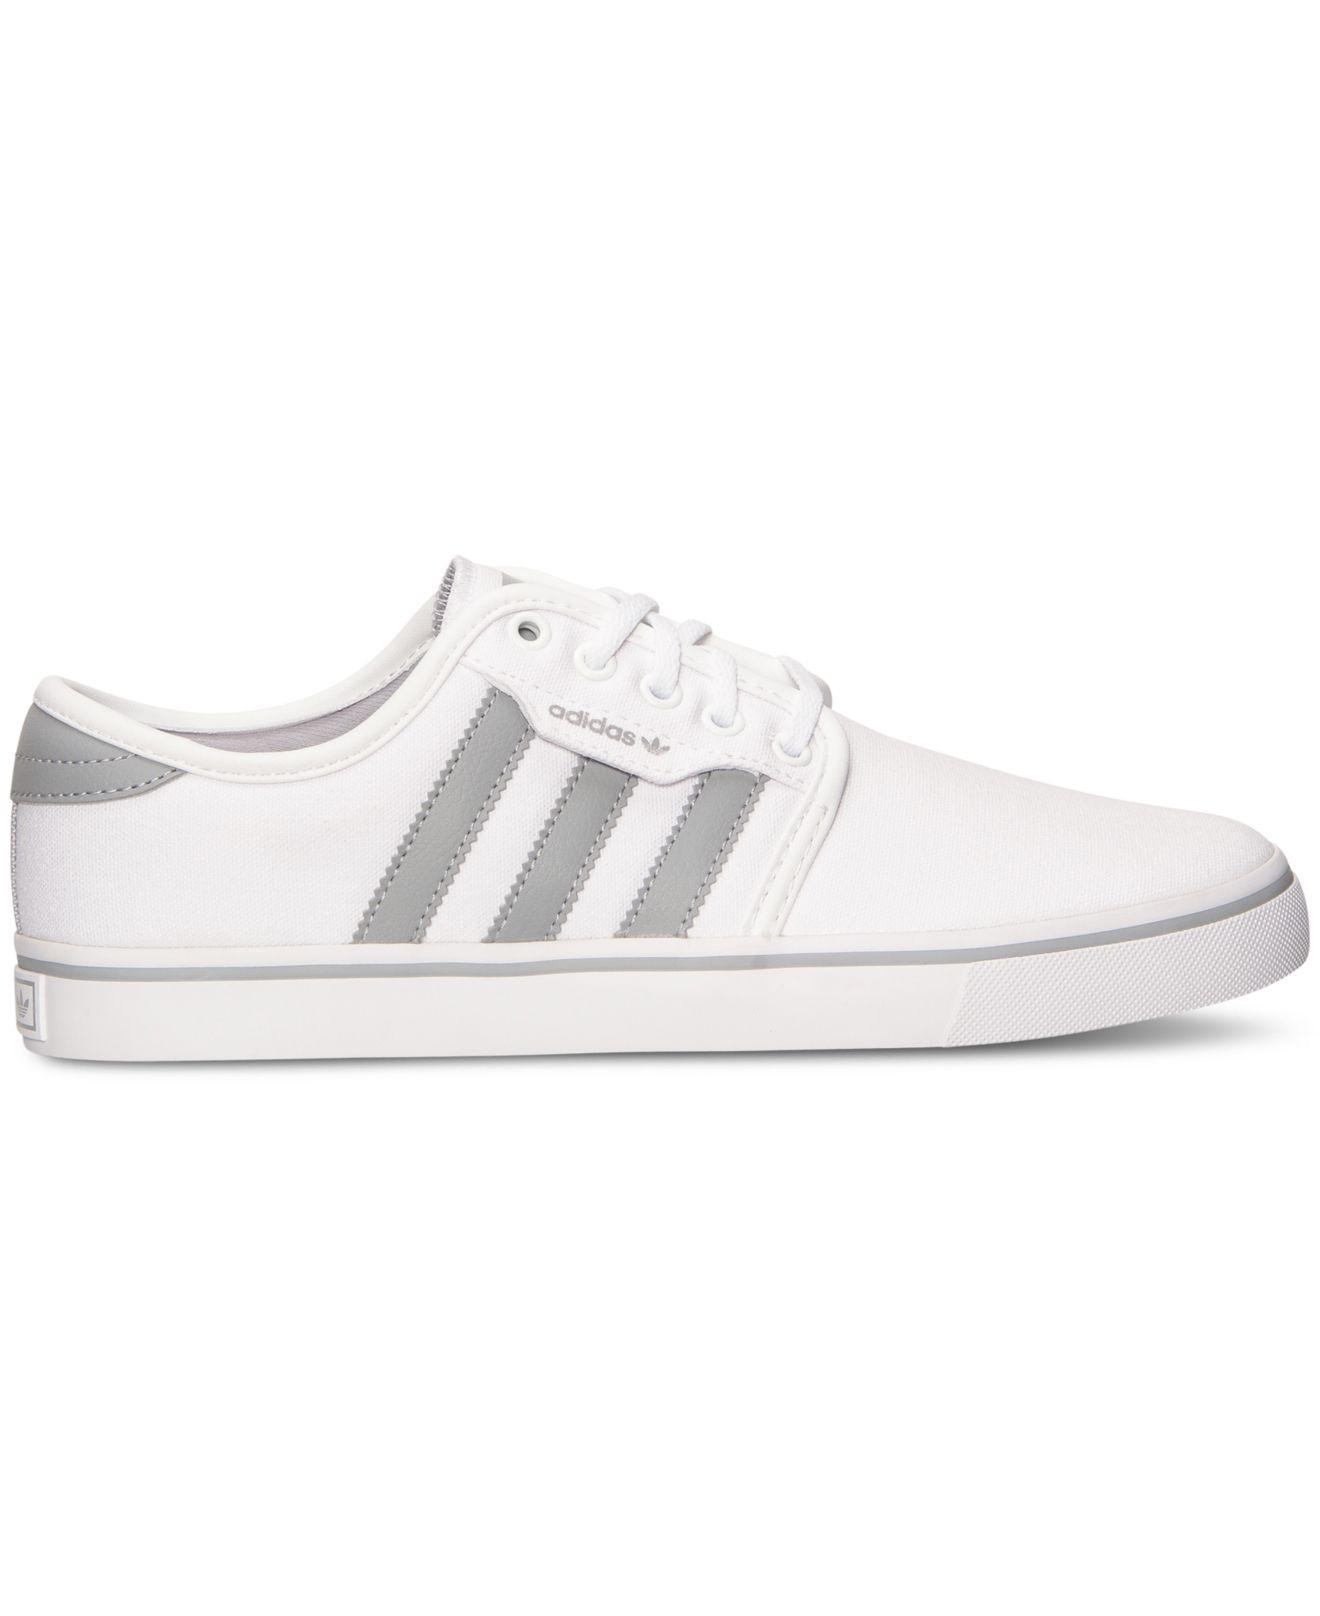 lyst adidas uomini scarpe casual da seeley traguardo in bianco.